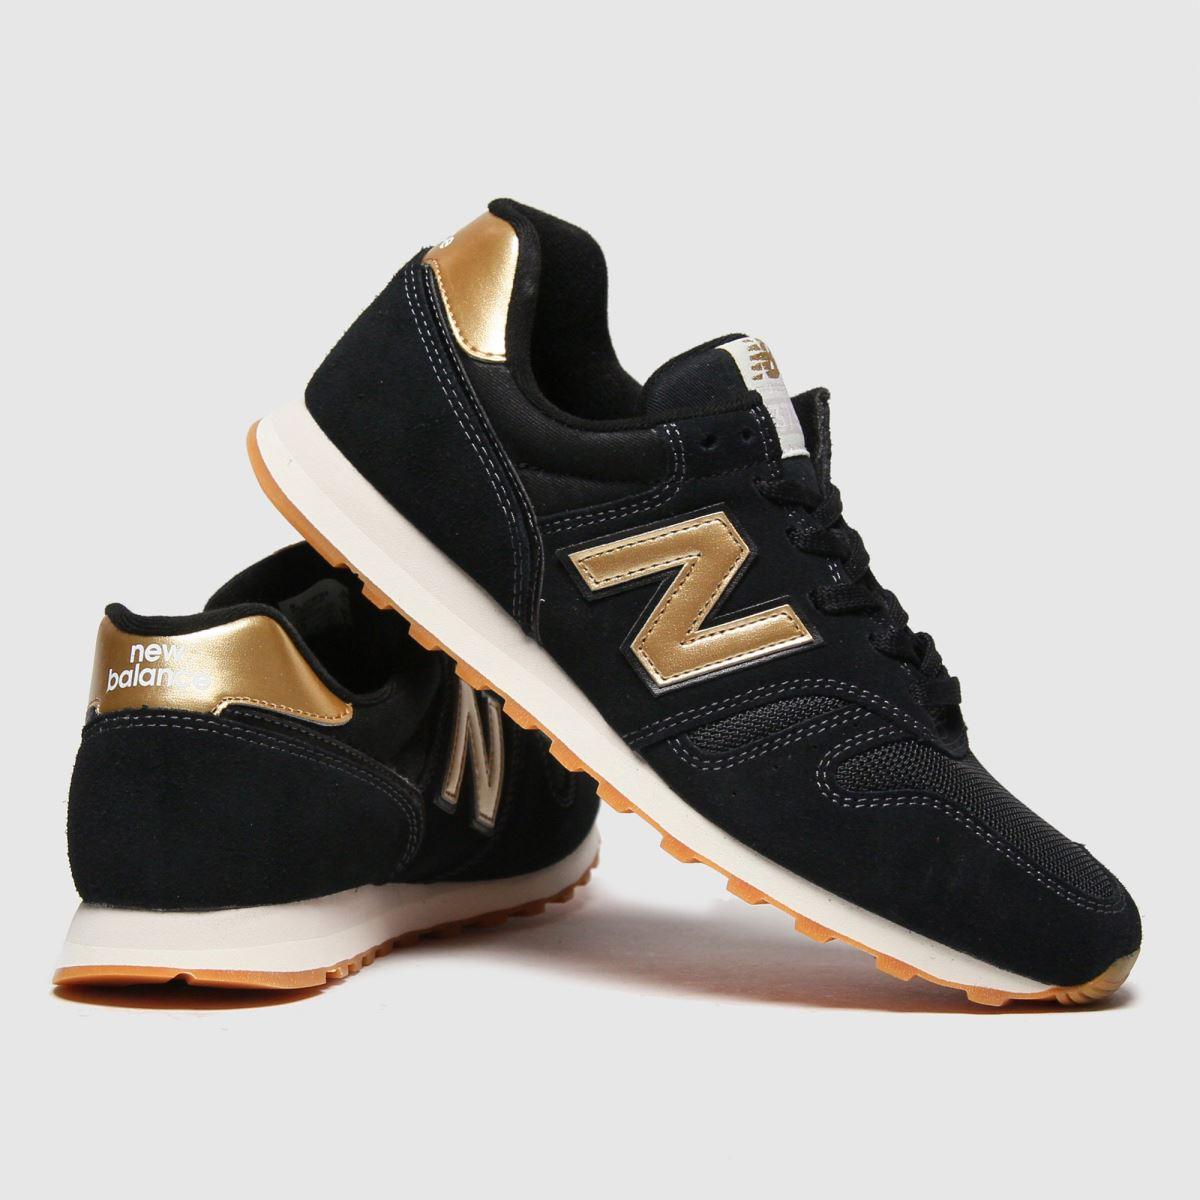 New balance black & gold 373 trainers